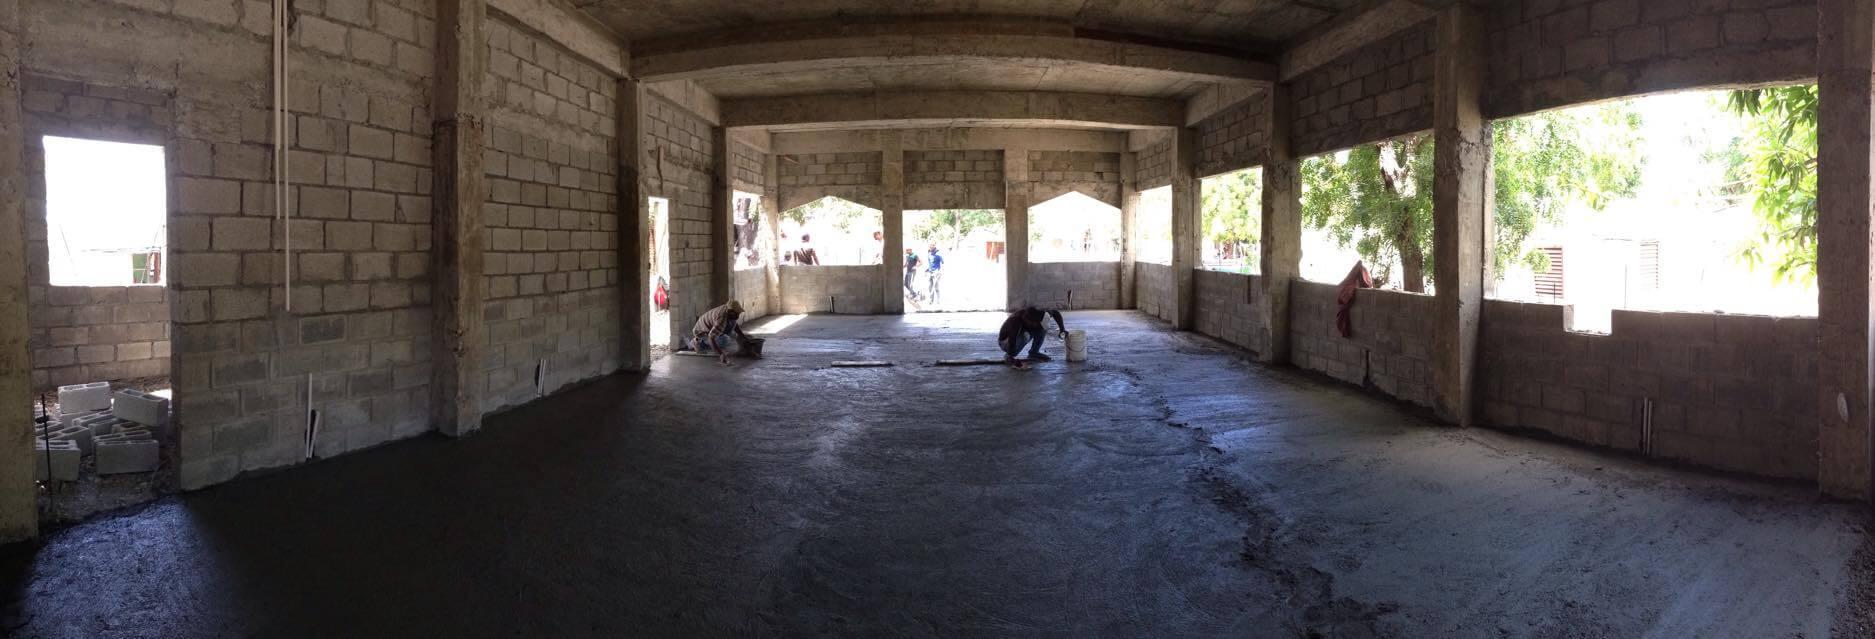 Preparing the church floor.